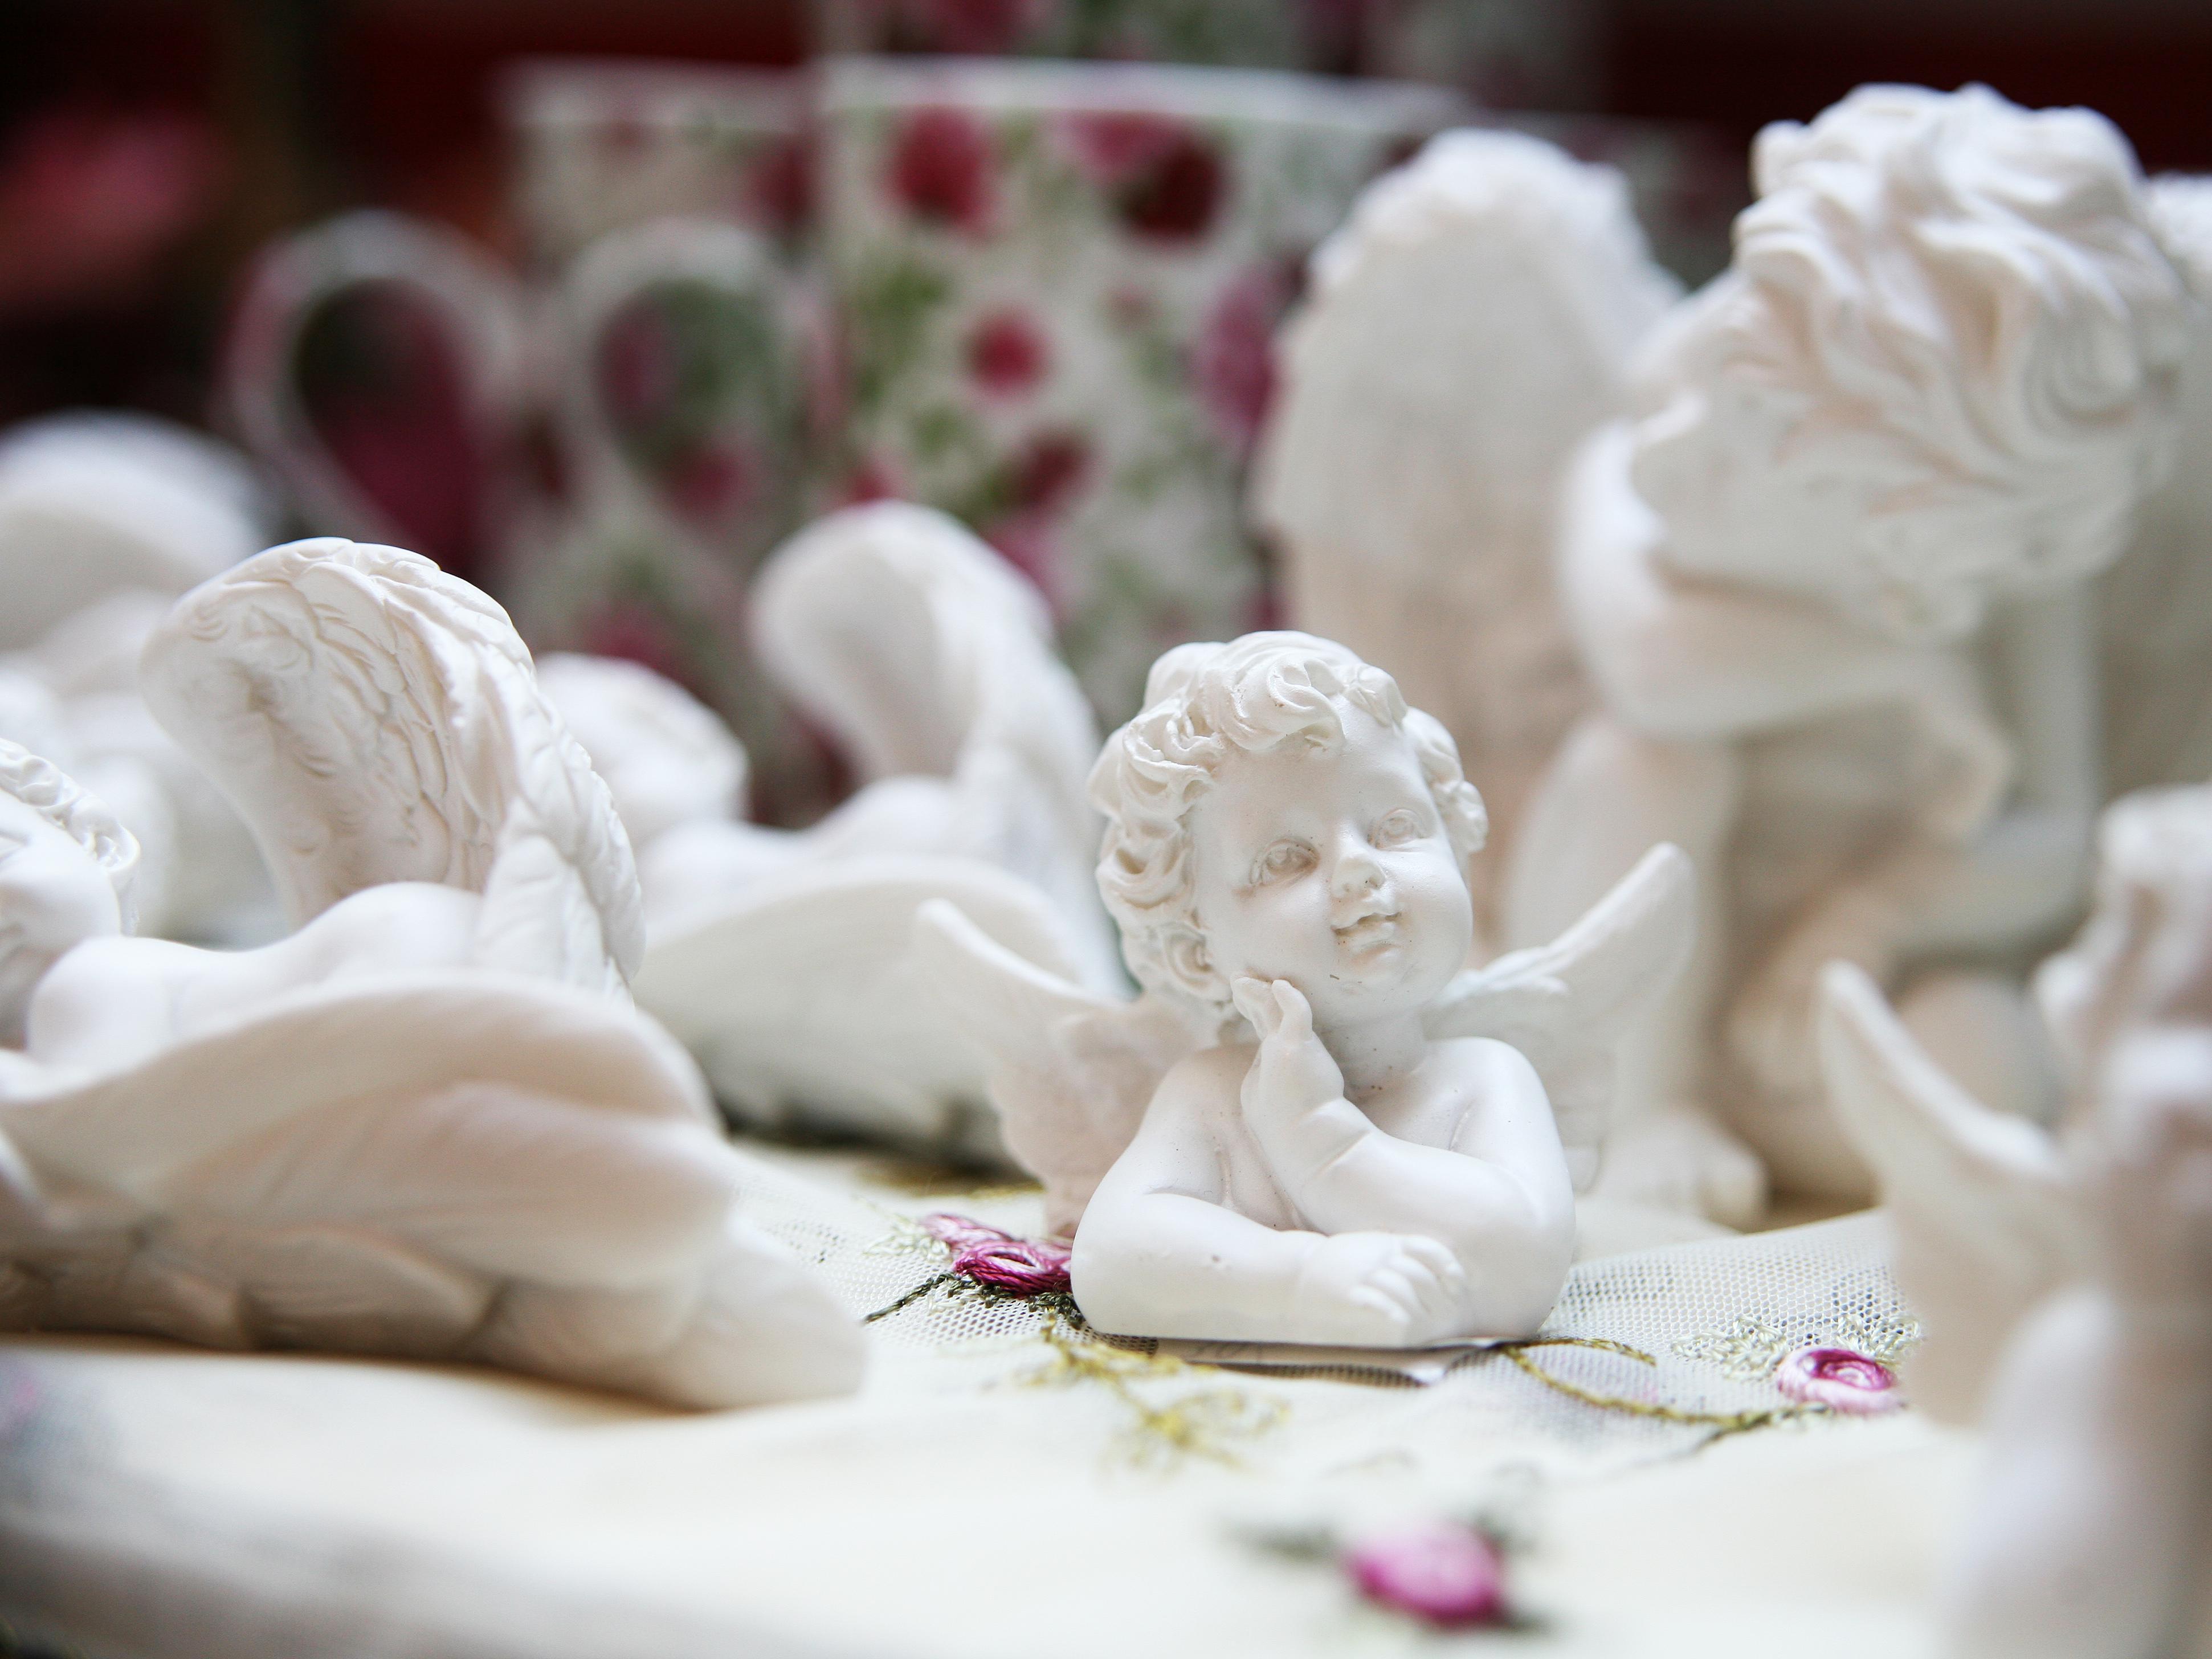 Nahaufnahme eines Engels aus Keramik